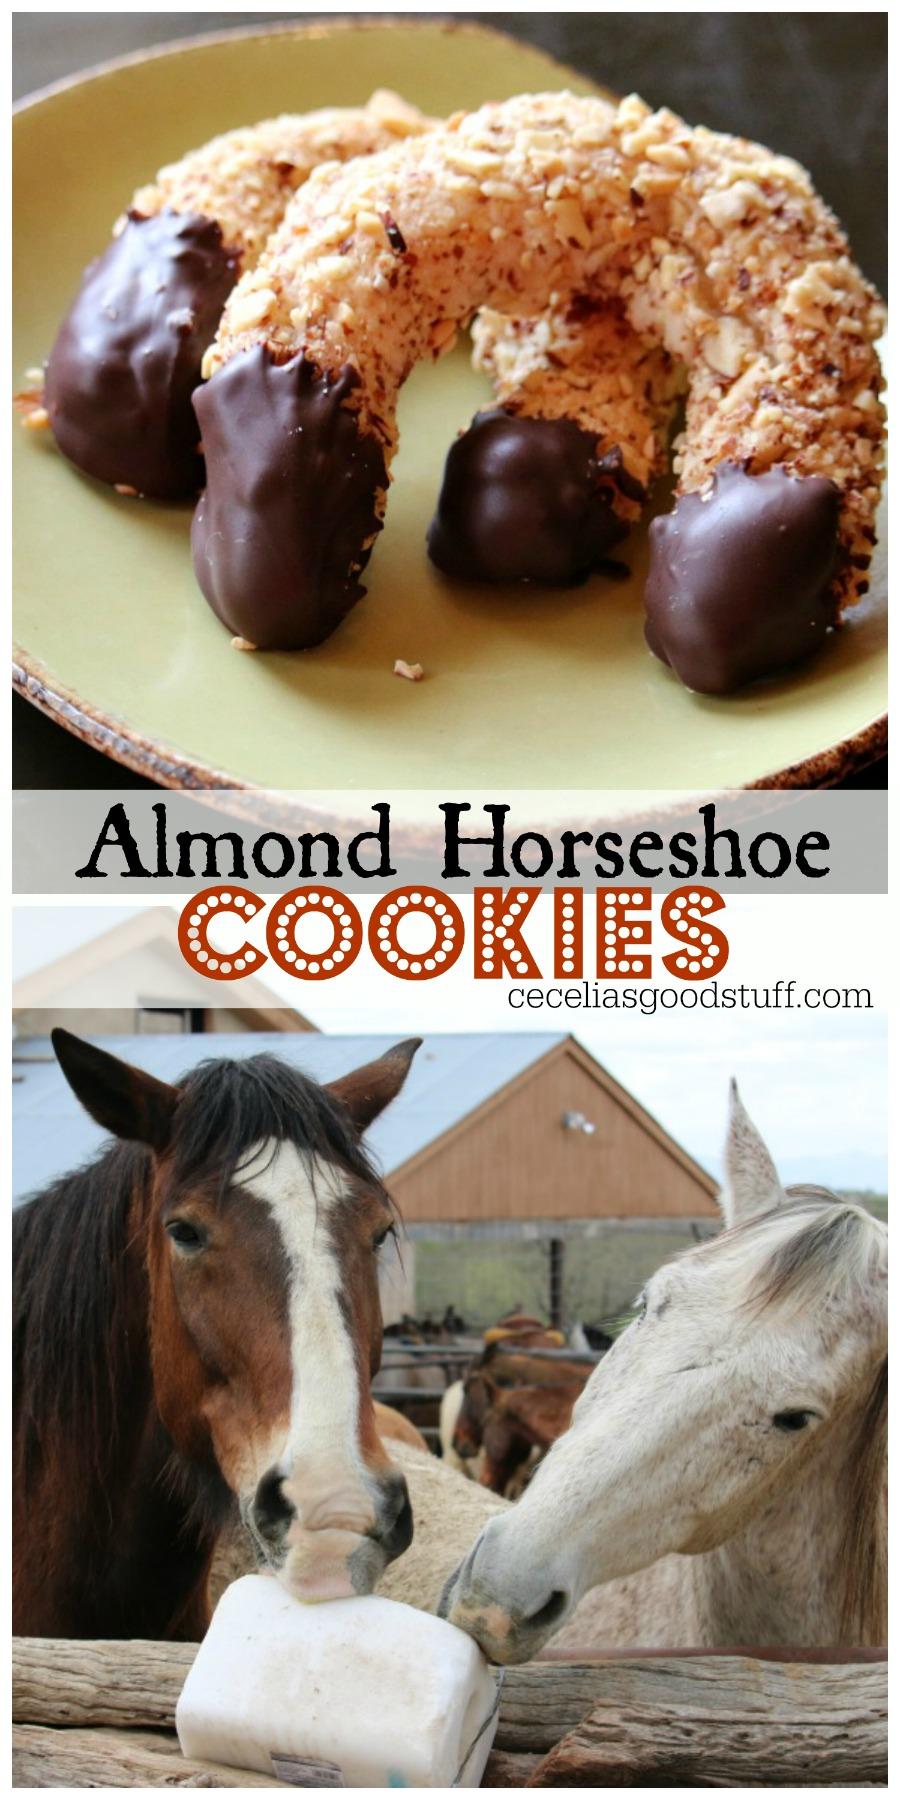 Recipe for Almond Horseshoe Cookies